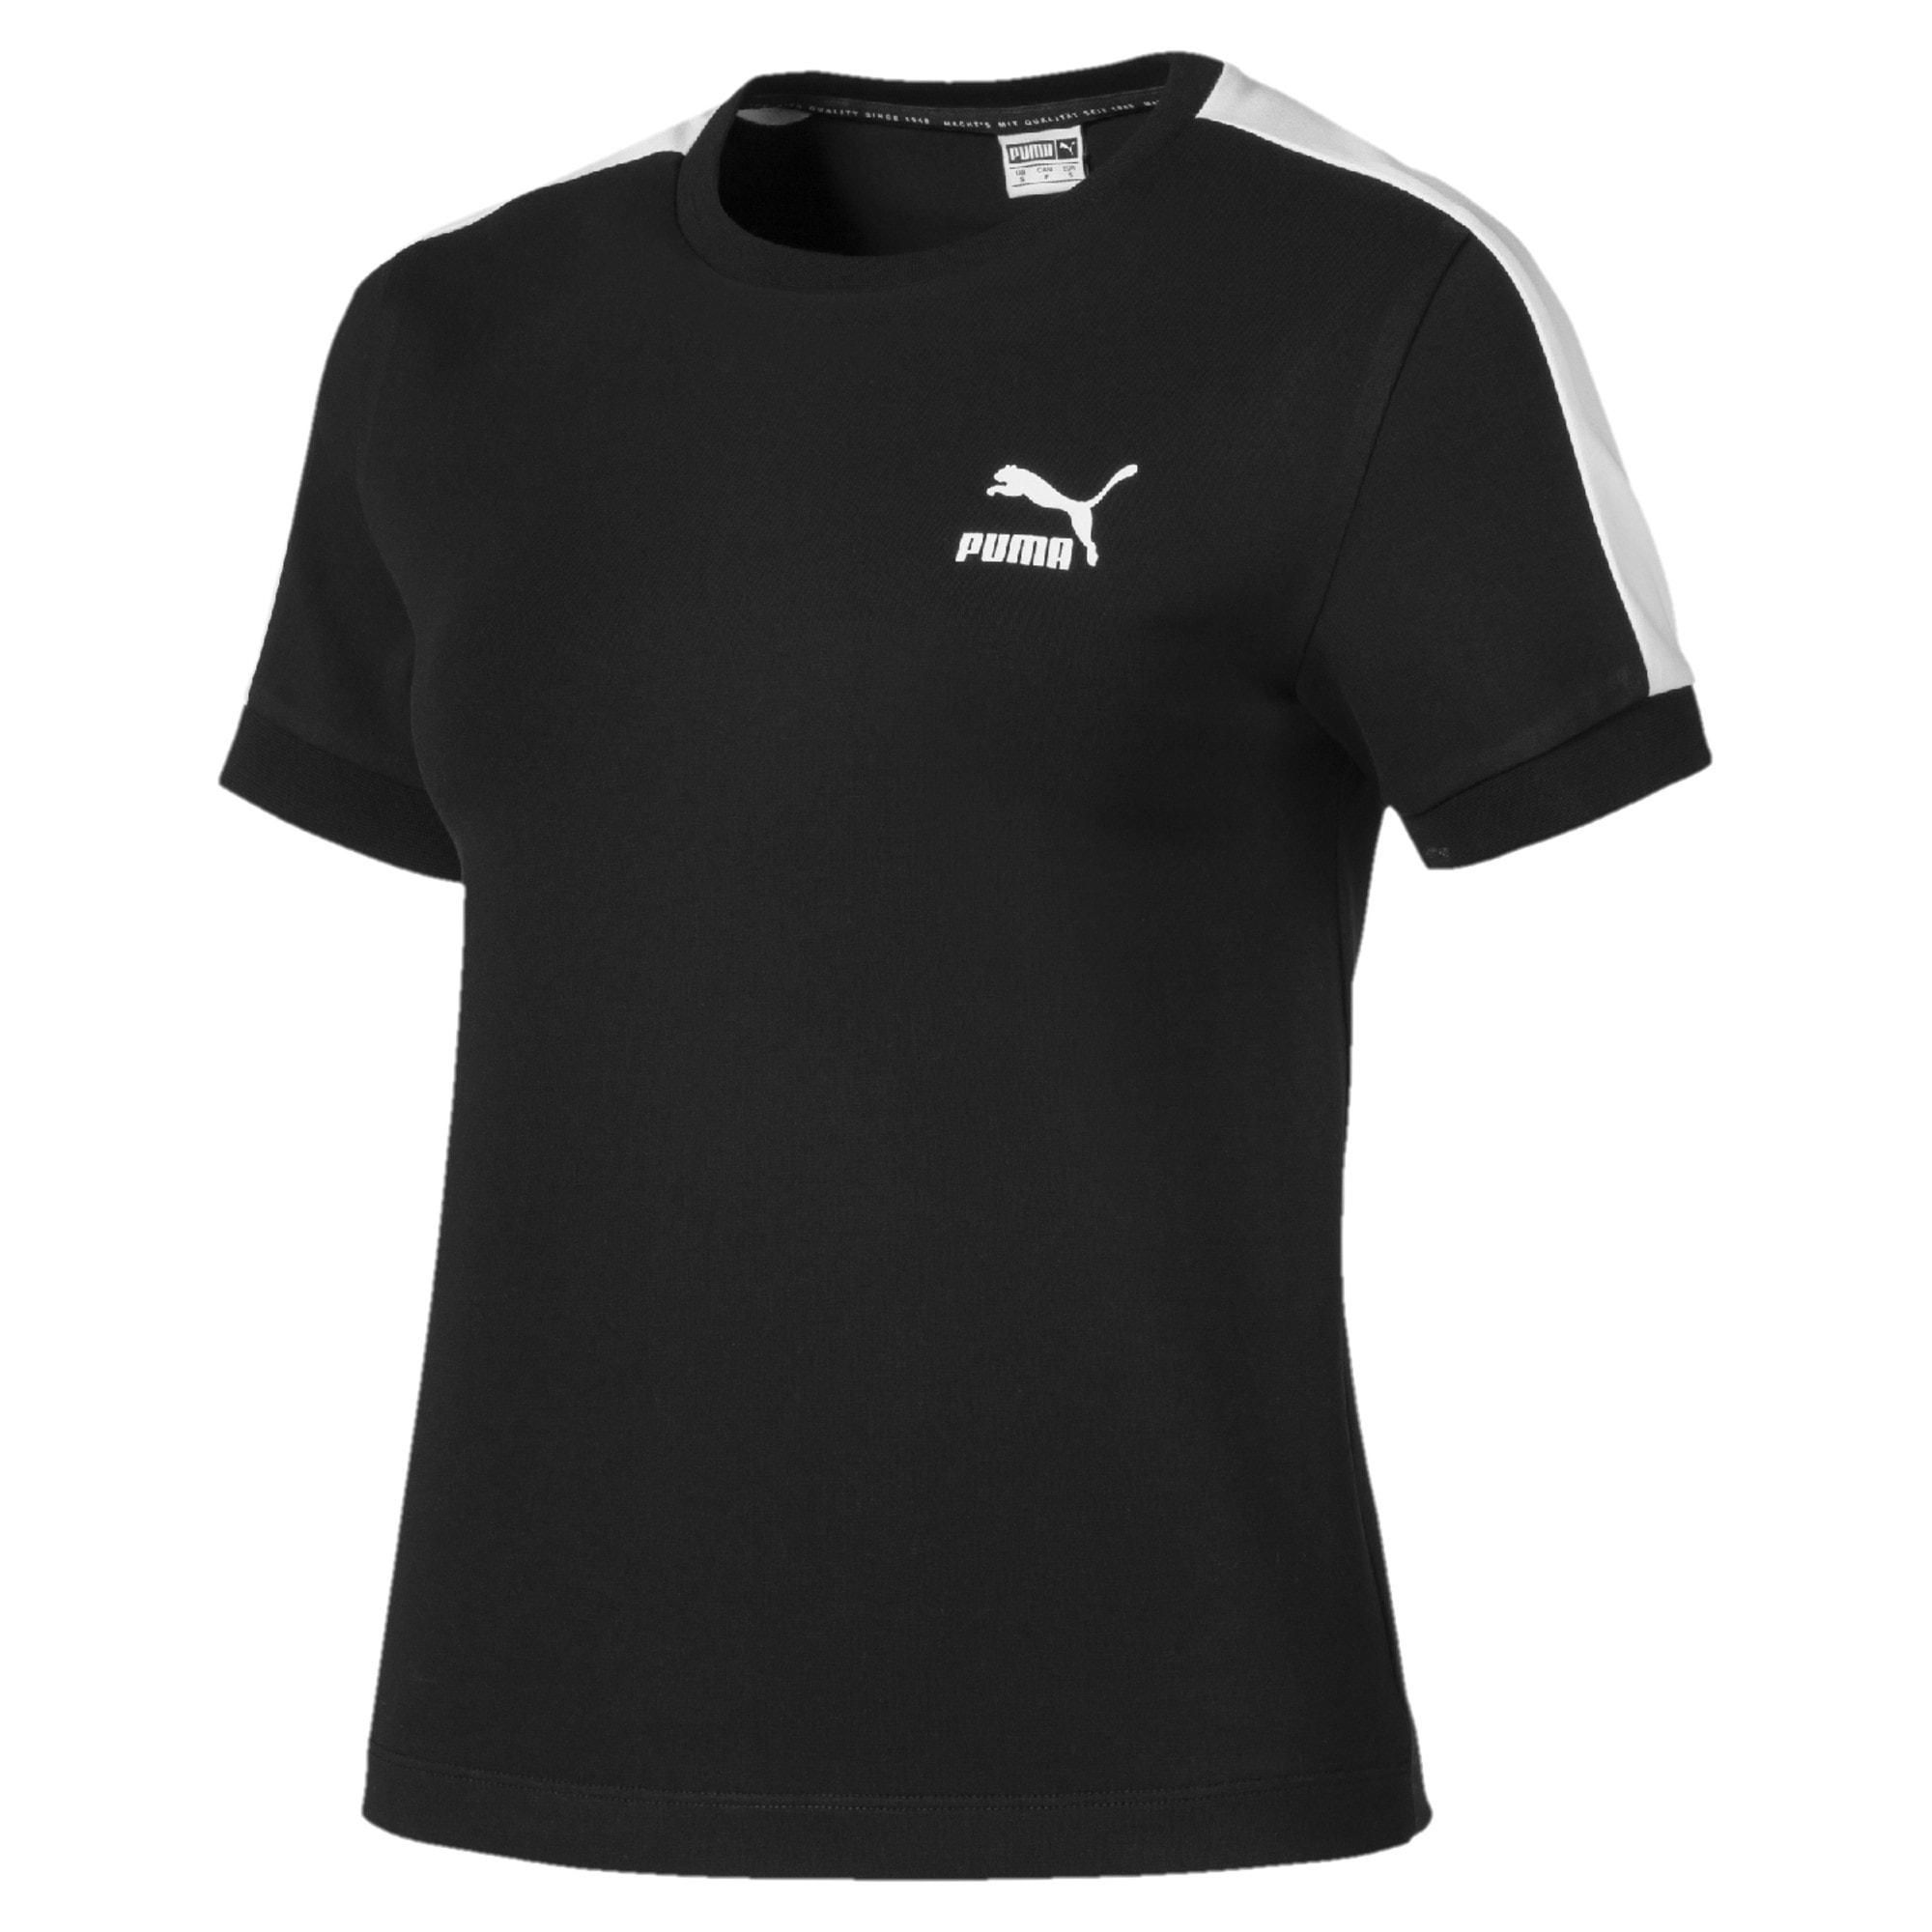 Thumbnail 4 of T-Shirt Classics T7 étroit pour femme, Cotton Black-puma white, medium